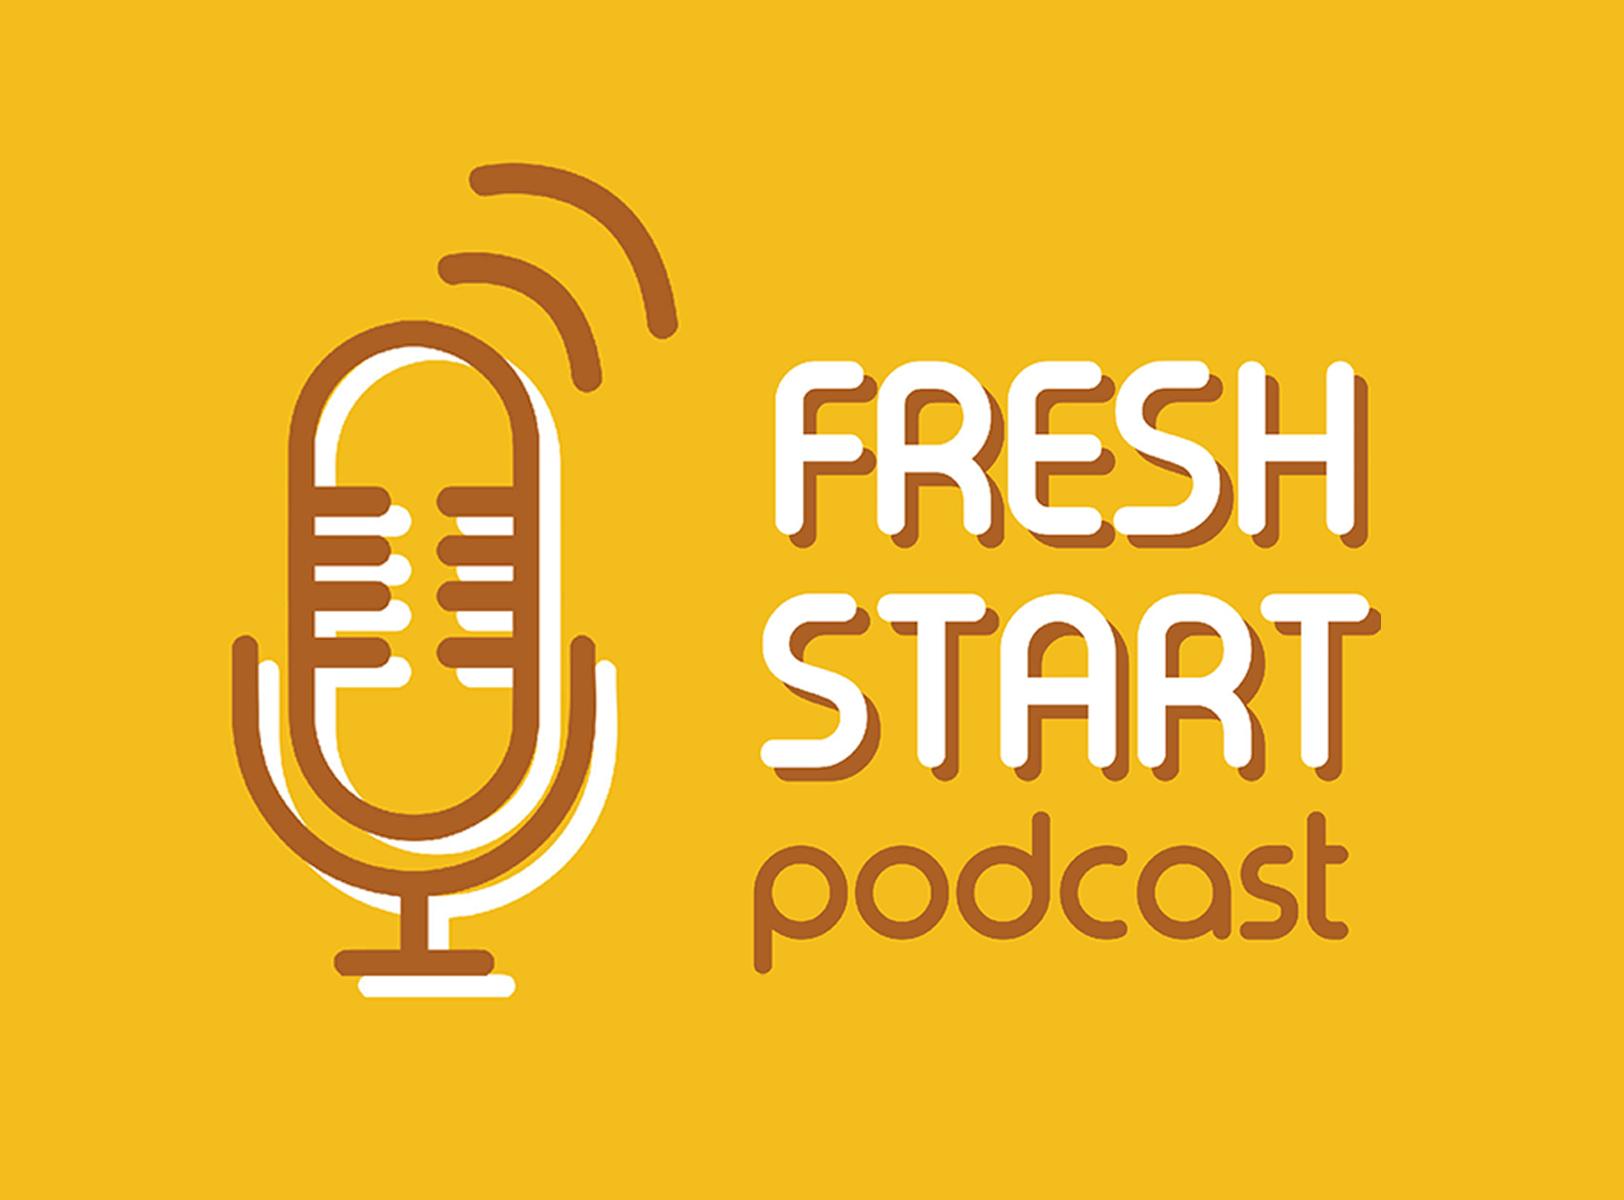 Fresh Start: Podcast News (5/25/2020 Mon.)